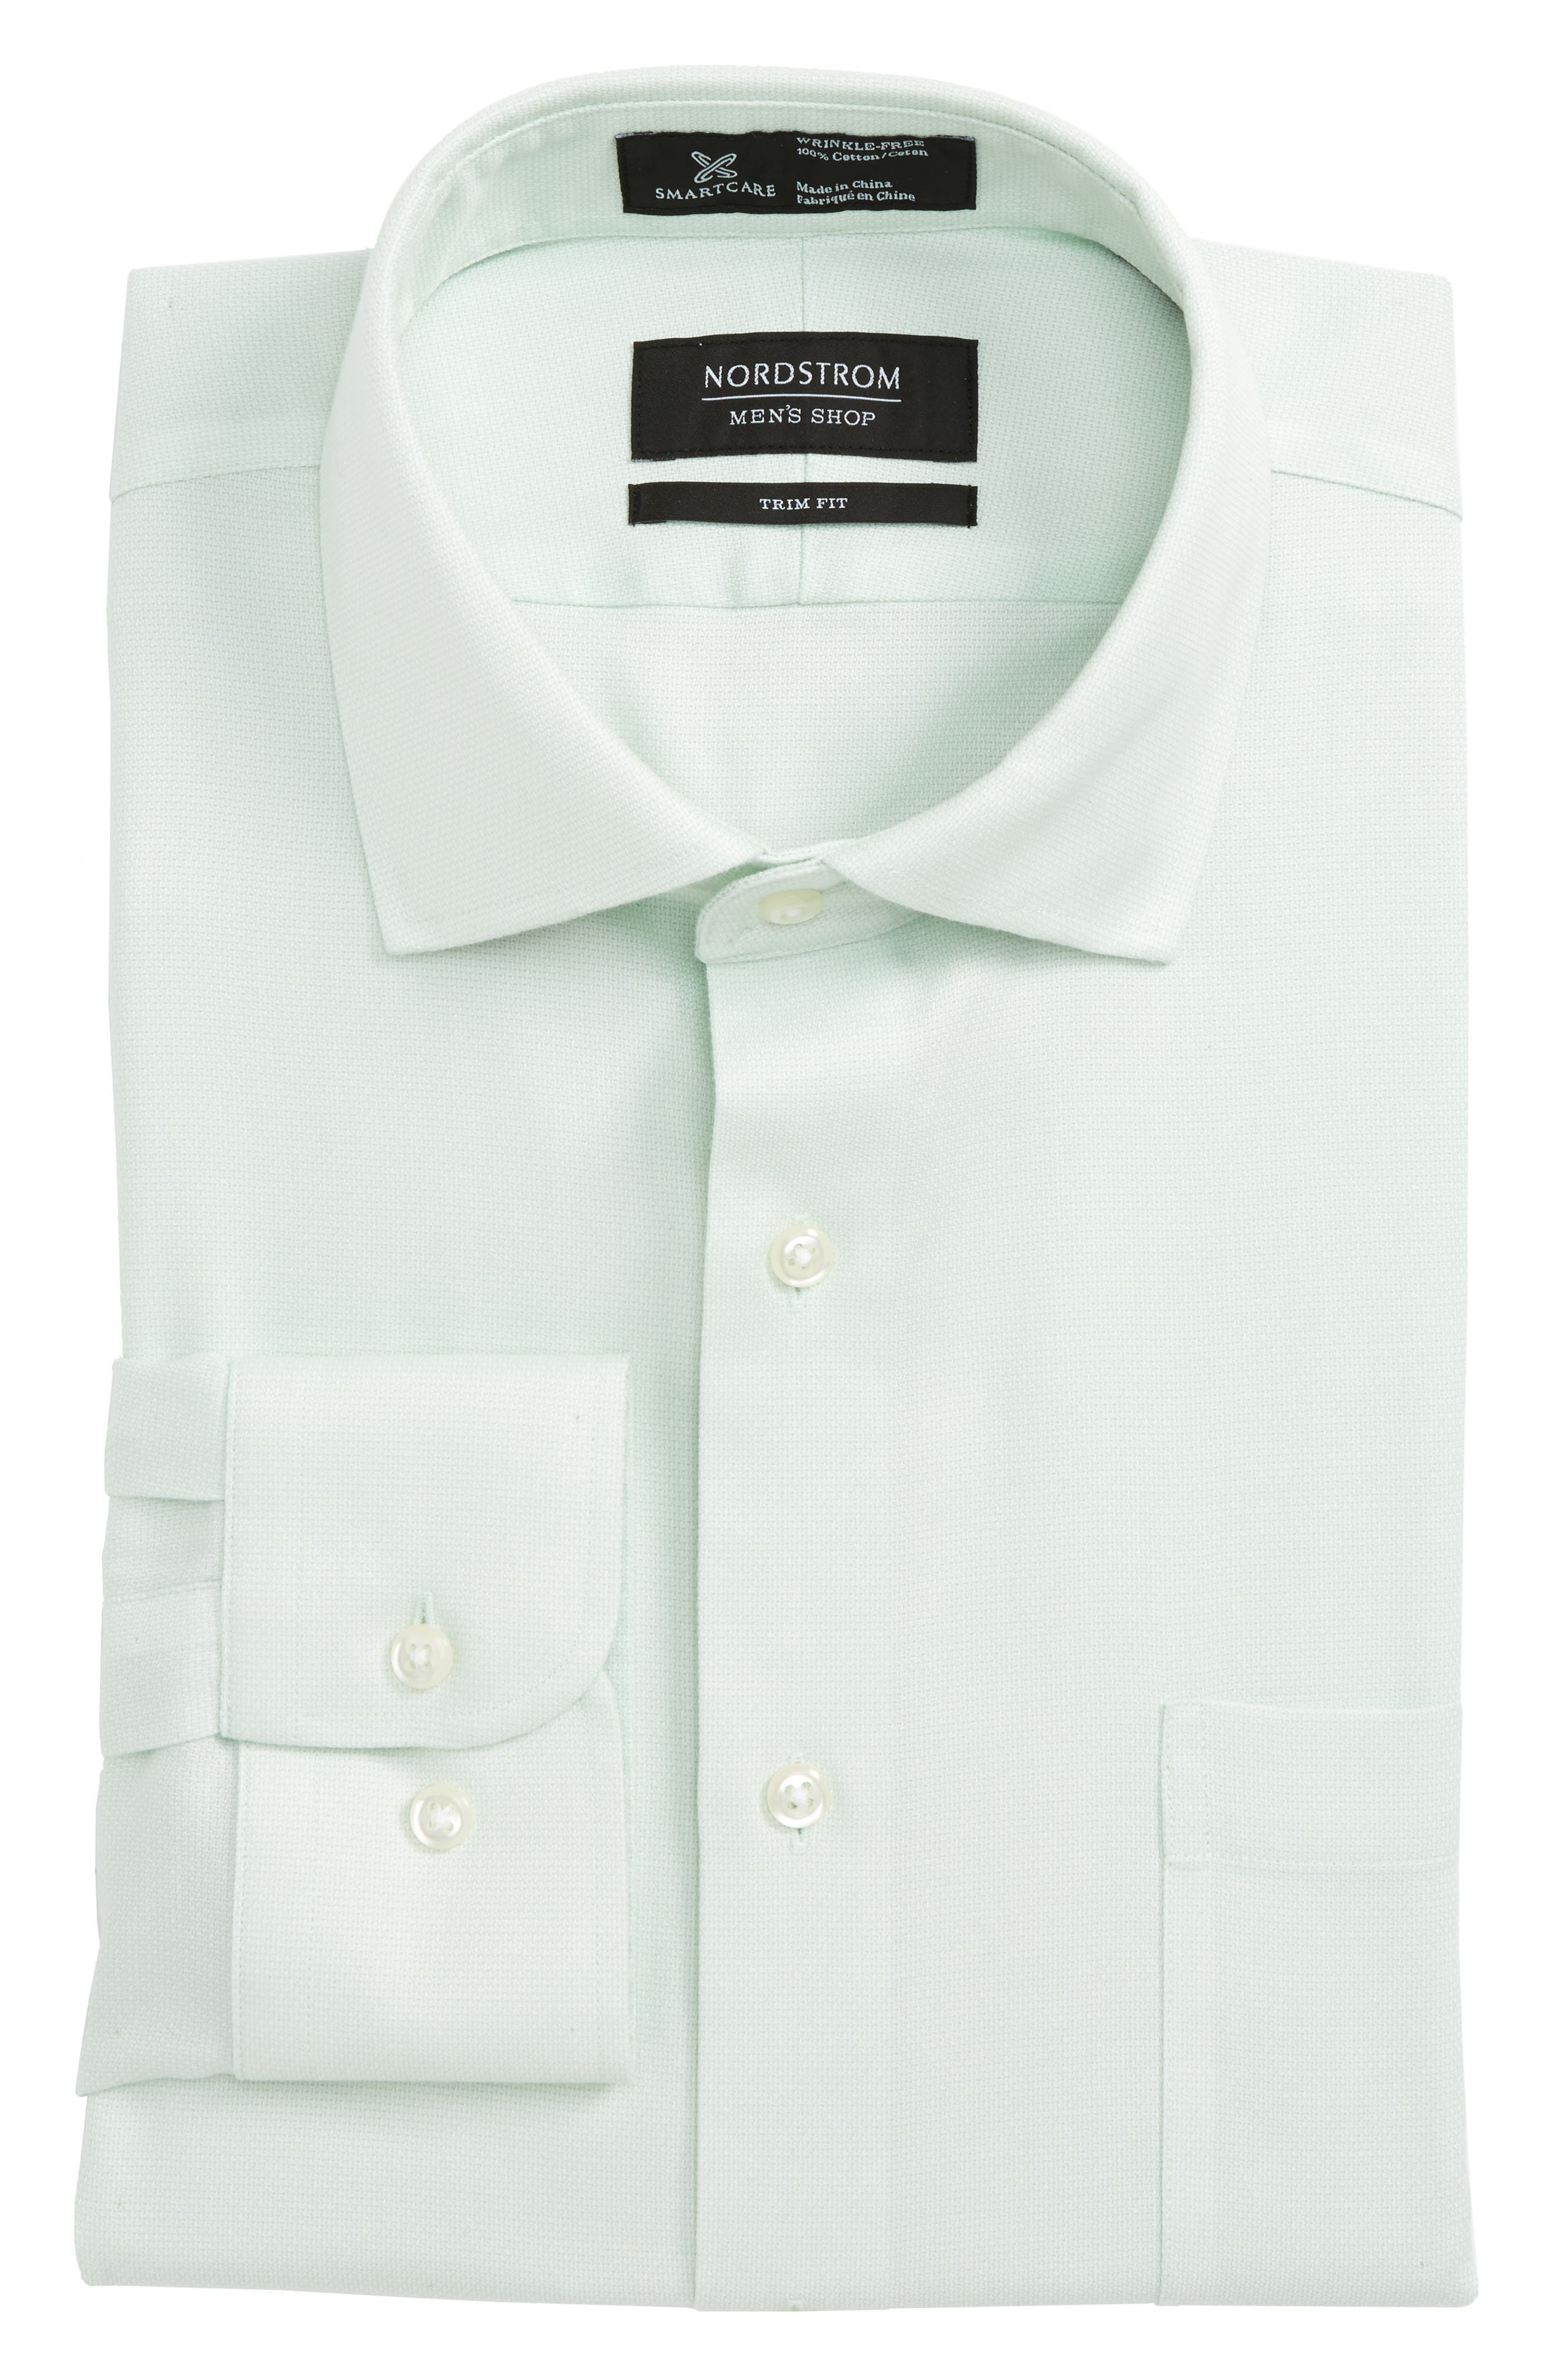 Nordstrom Men's Shop Smartcare™ Trim Fit Oxford Dress Shirt